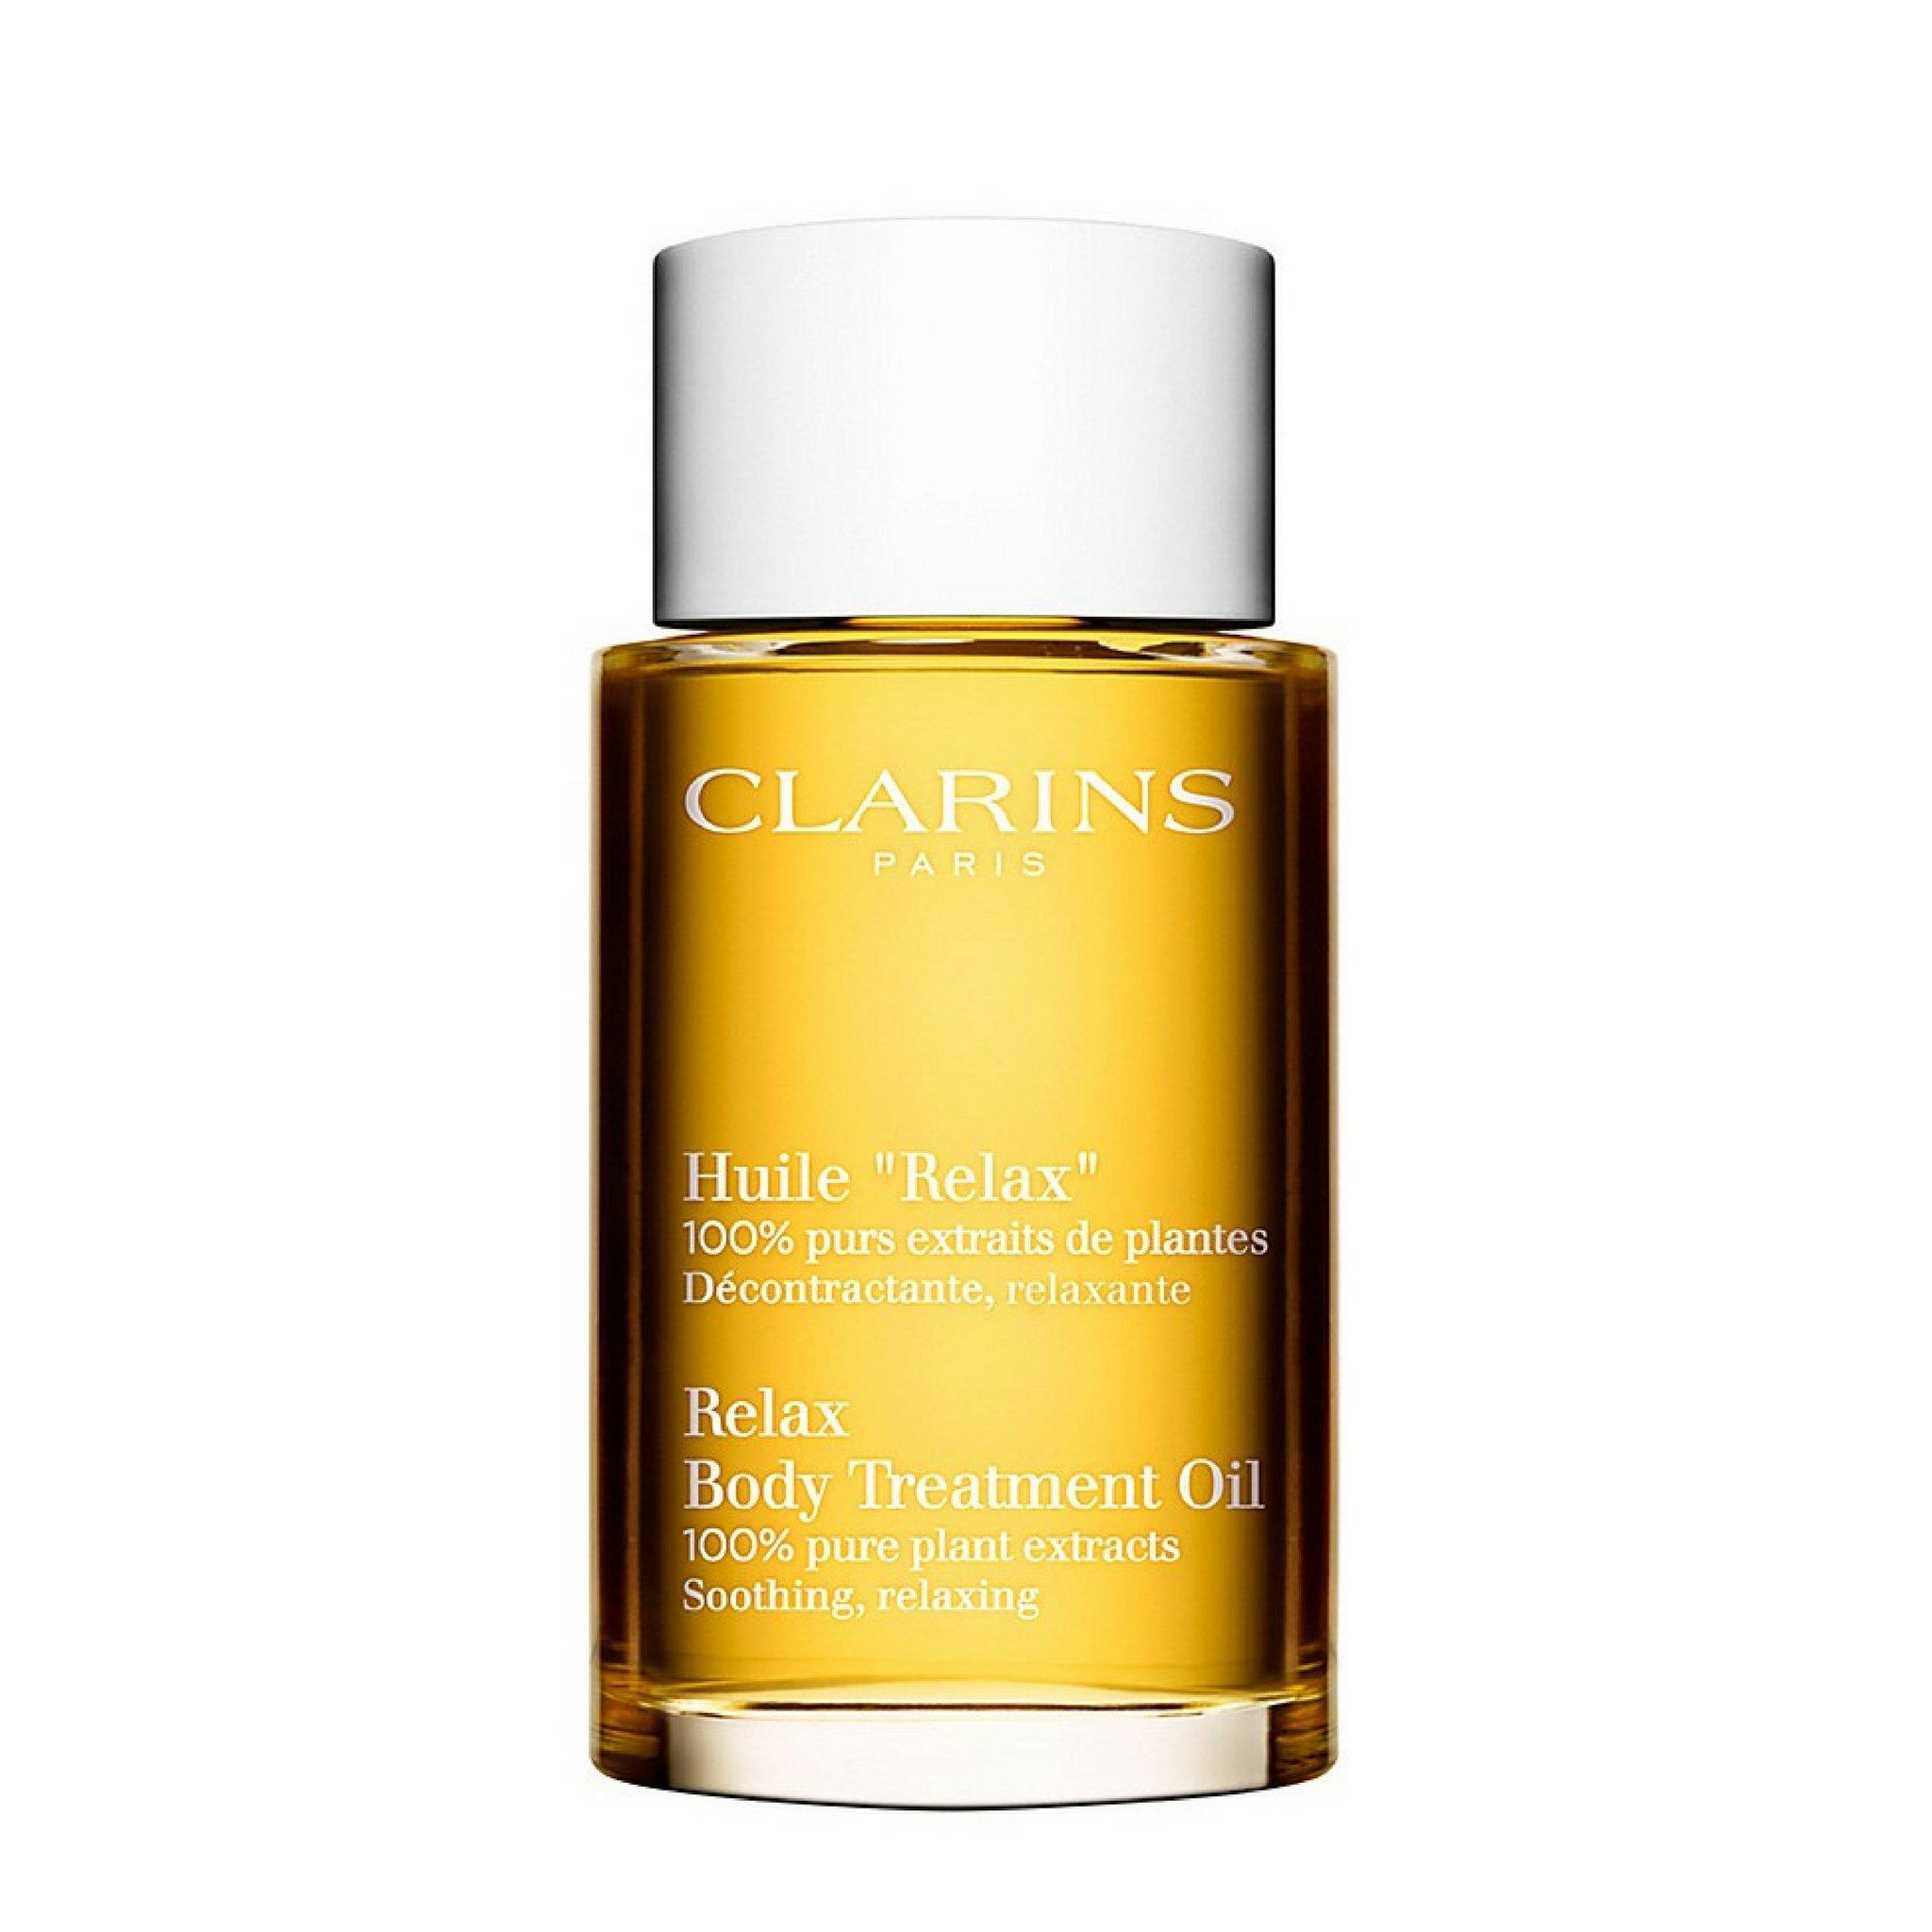 Clarins - Huile Anti-Eau Body Treatment Oil 100 ml. /Body Care